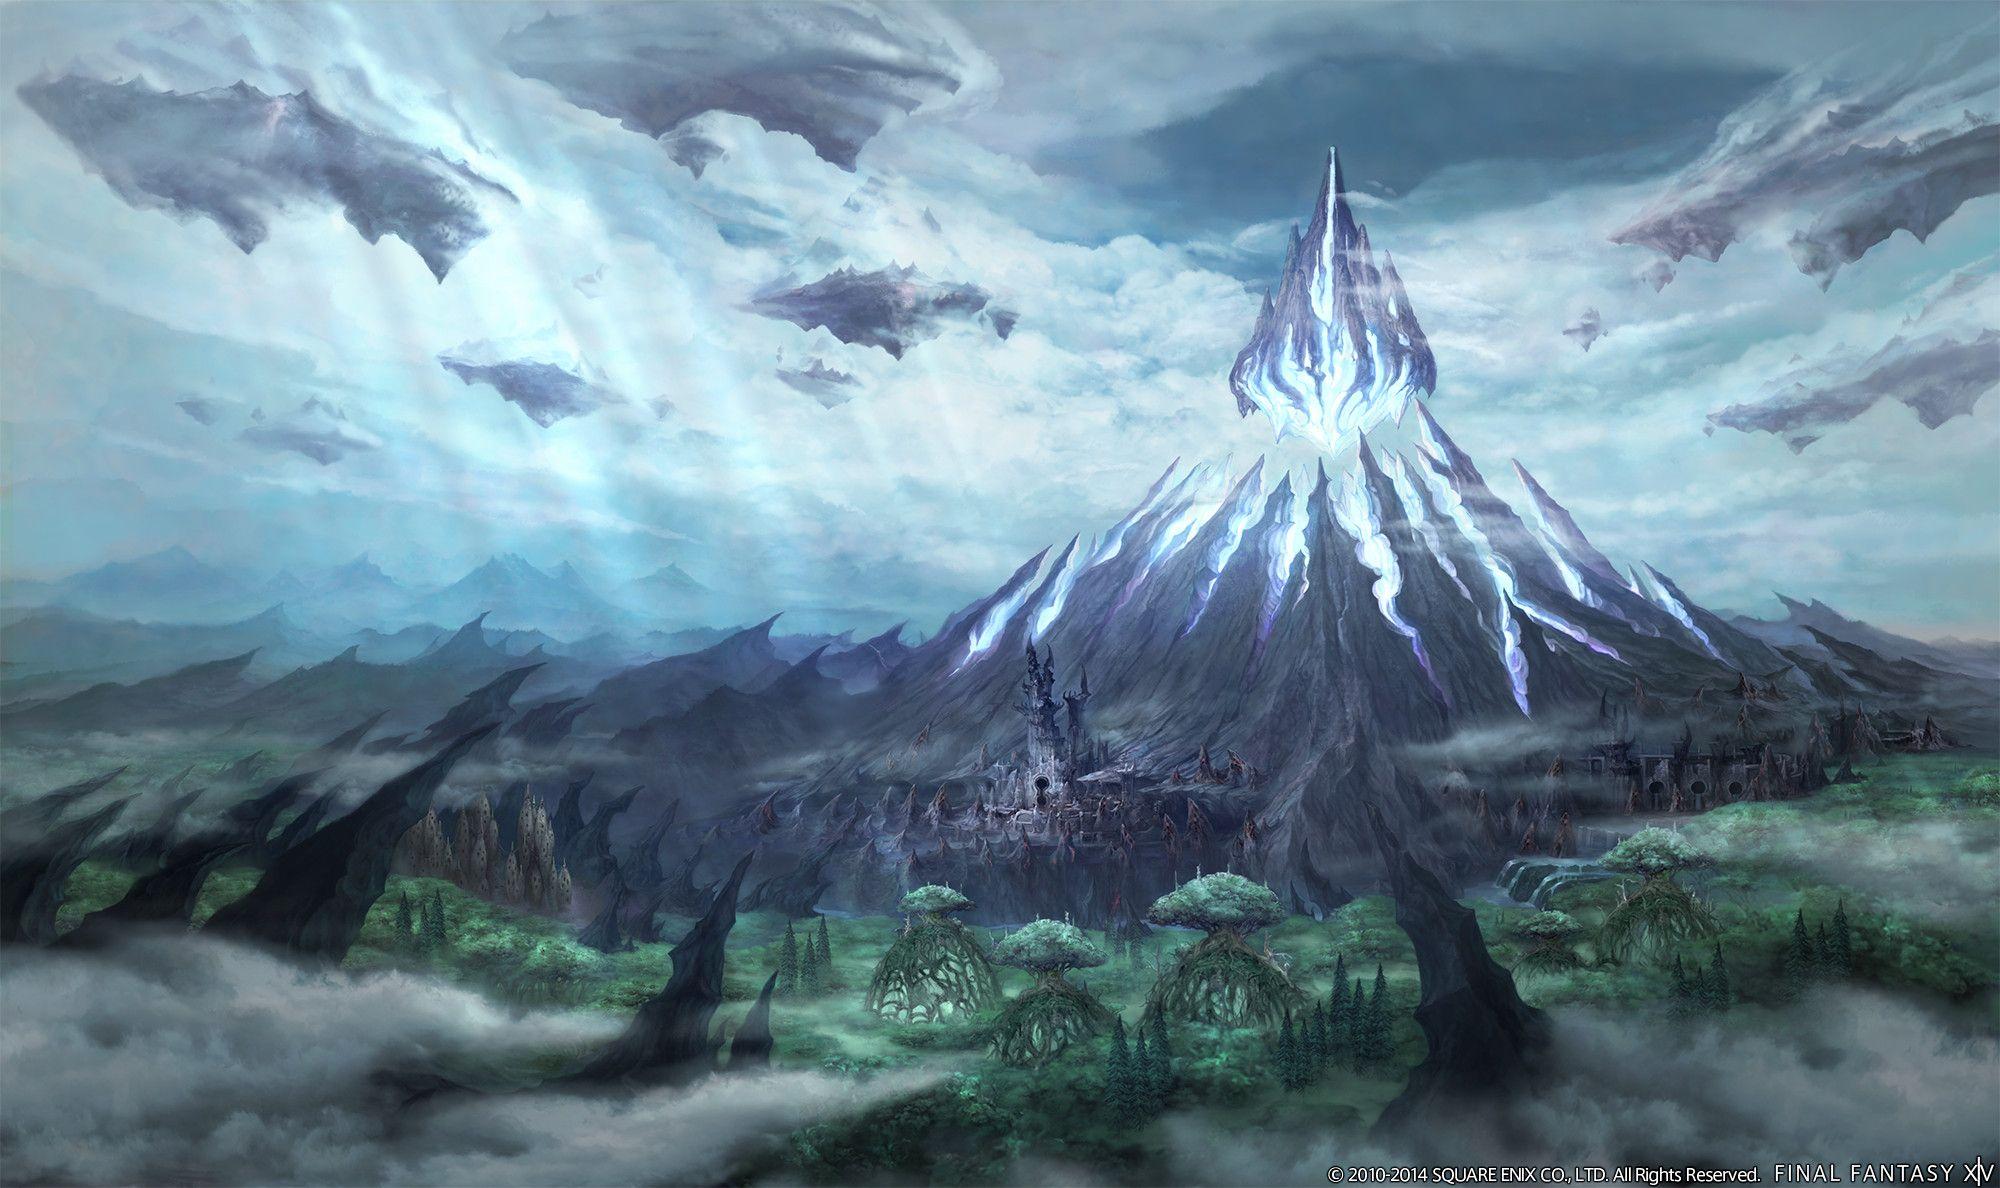 Final Fantasy Xiv Heavensward Environment Screens Artworks Fantasy Concept Art Fantasy Landscape Final Fantasy Xiv